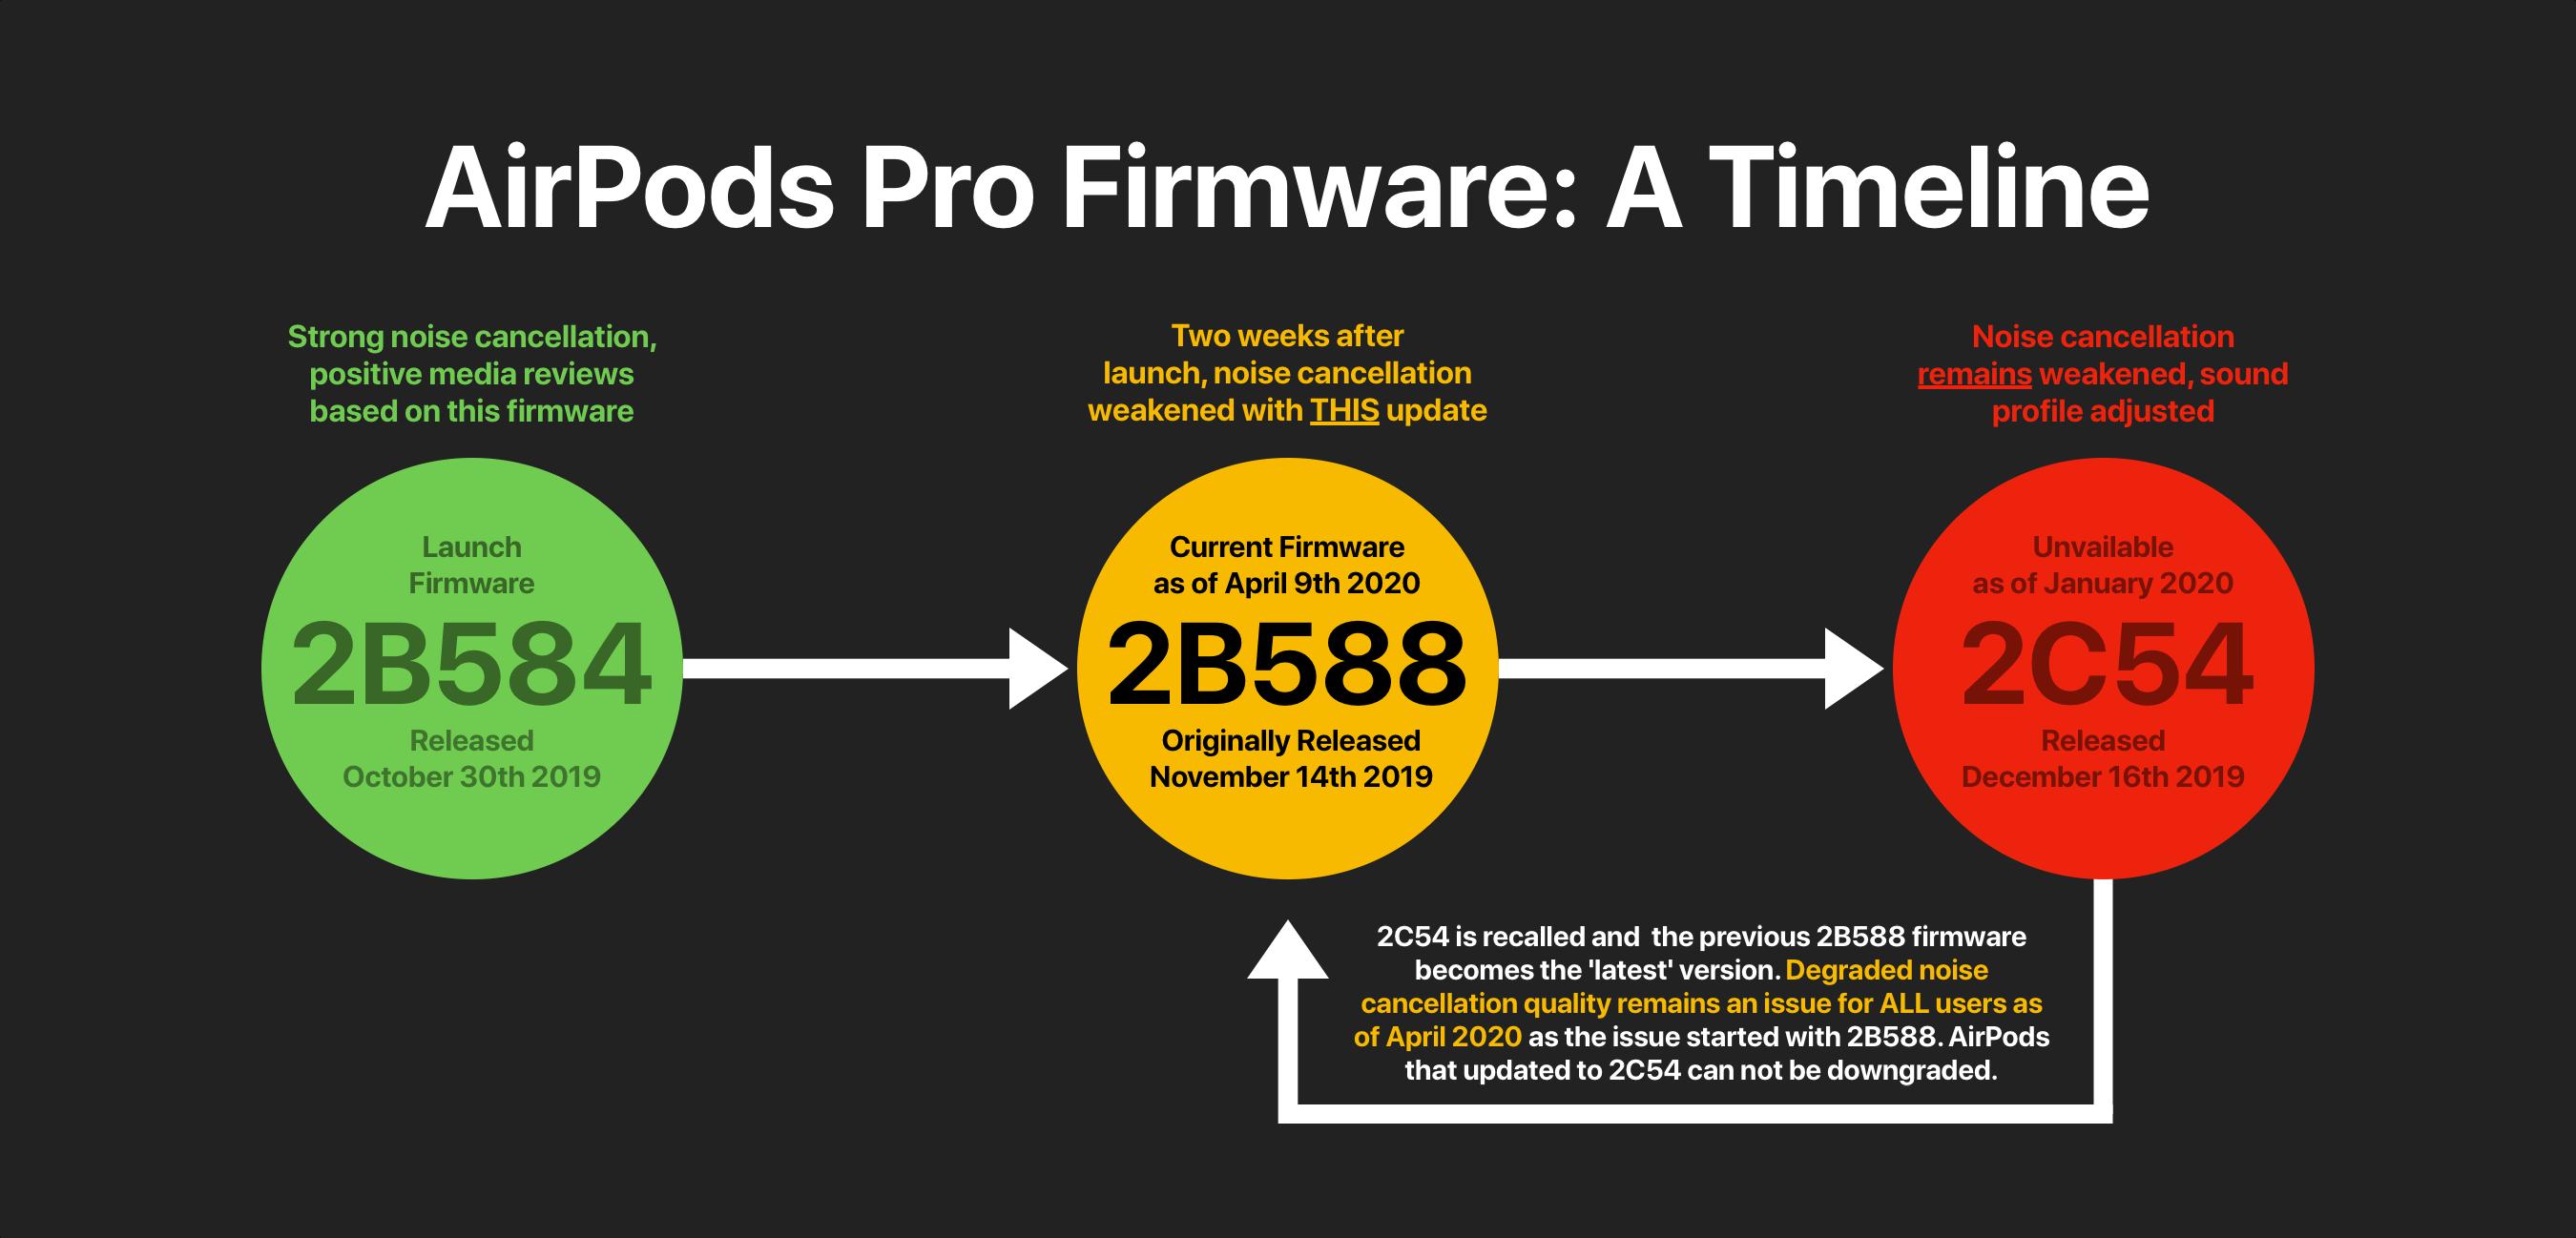 airpods pro 2d27 firmware reddit